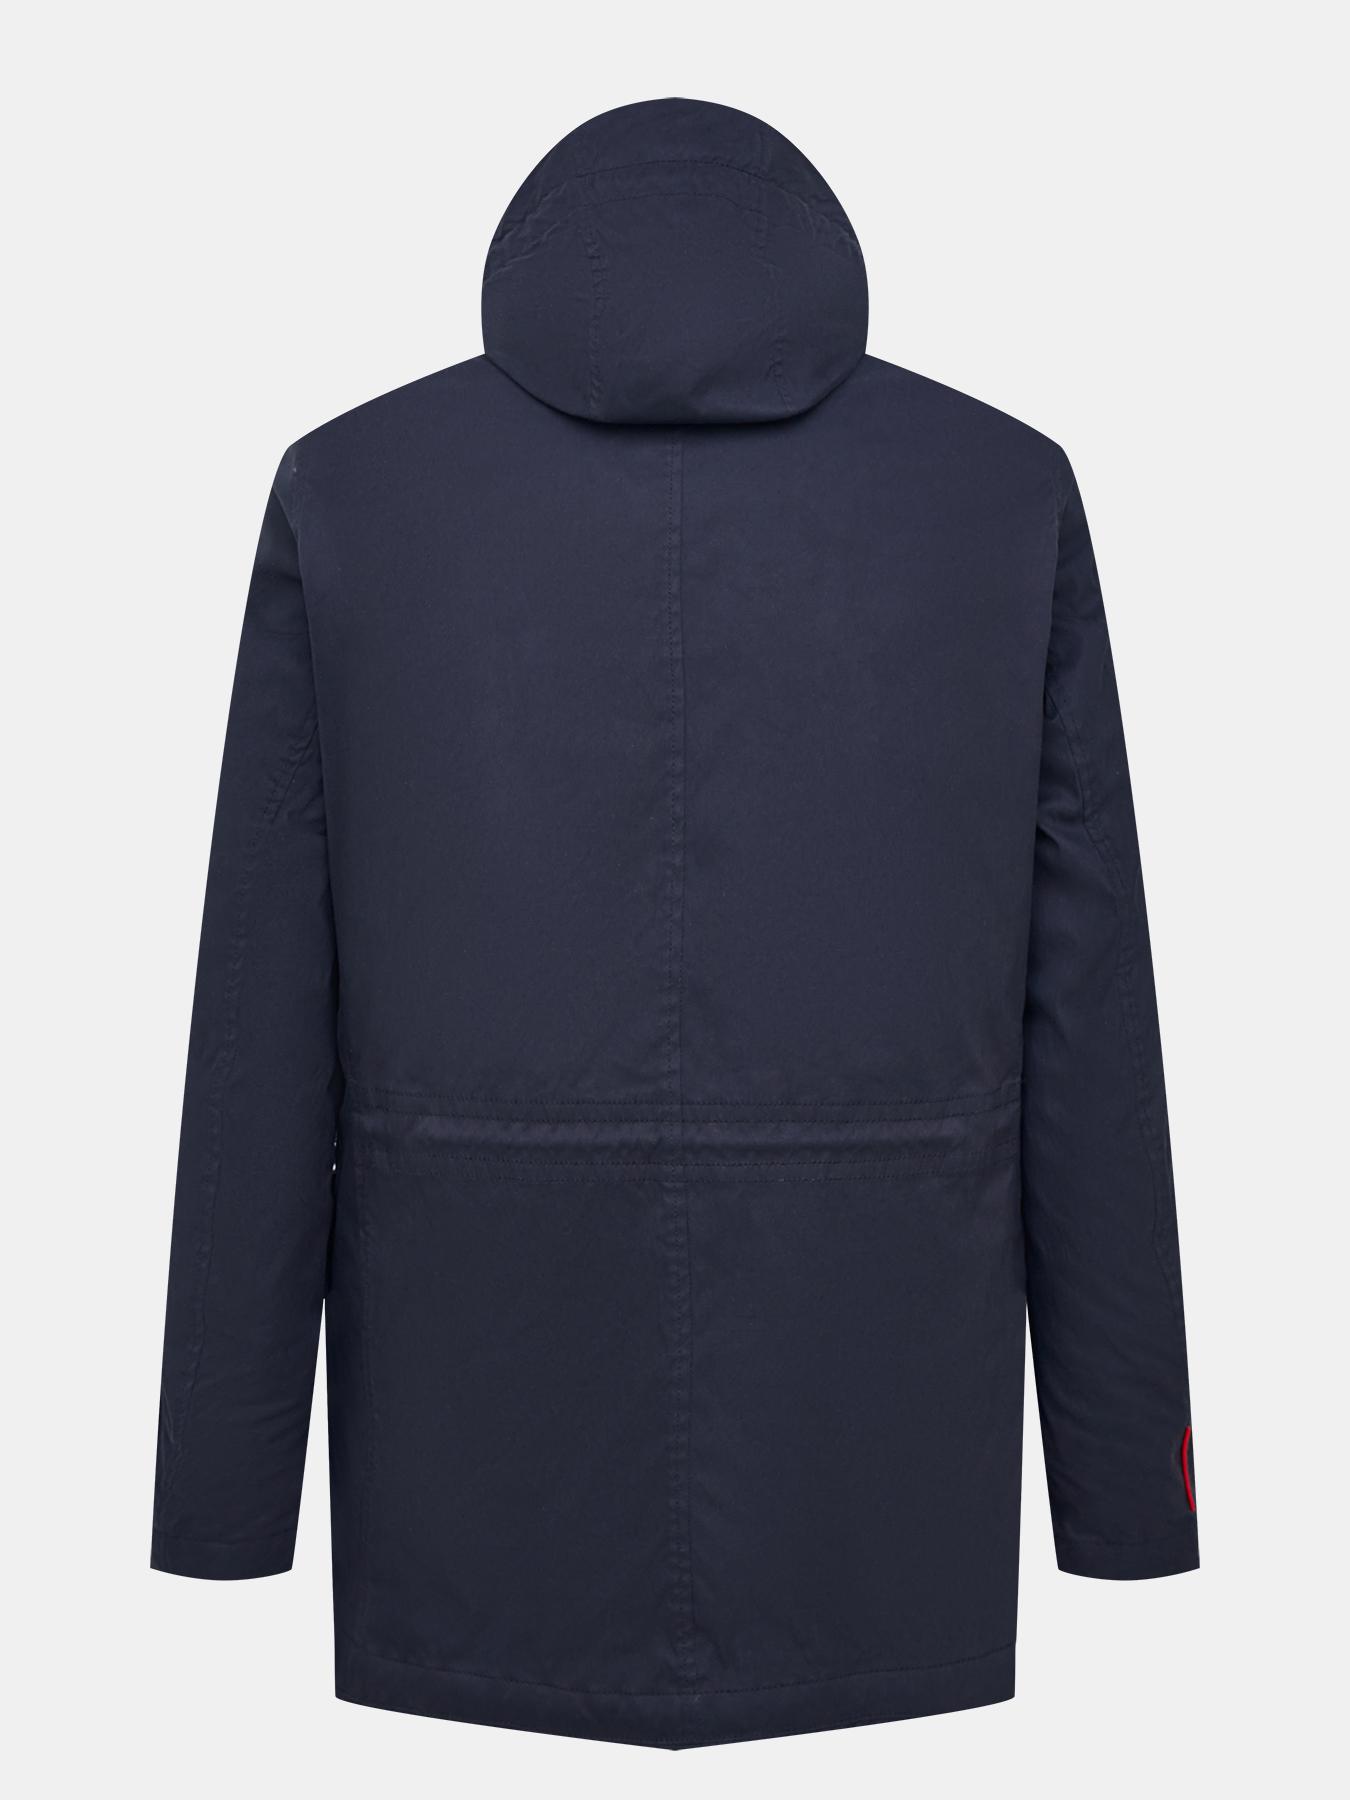 Куртка Strellson Куртка 2 в 1 куртка кожаная strellson strellson st004emghji3